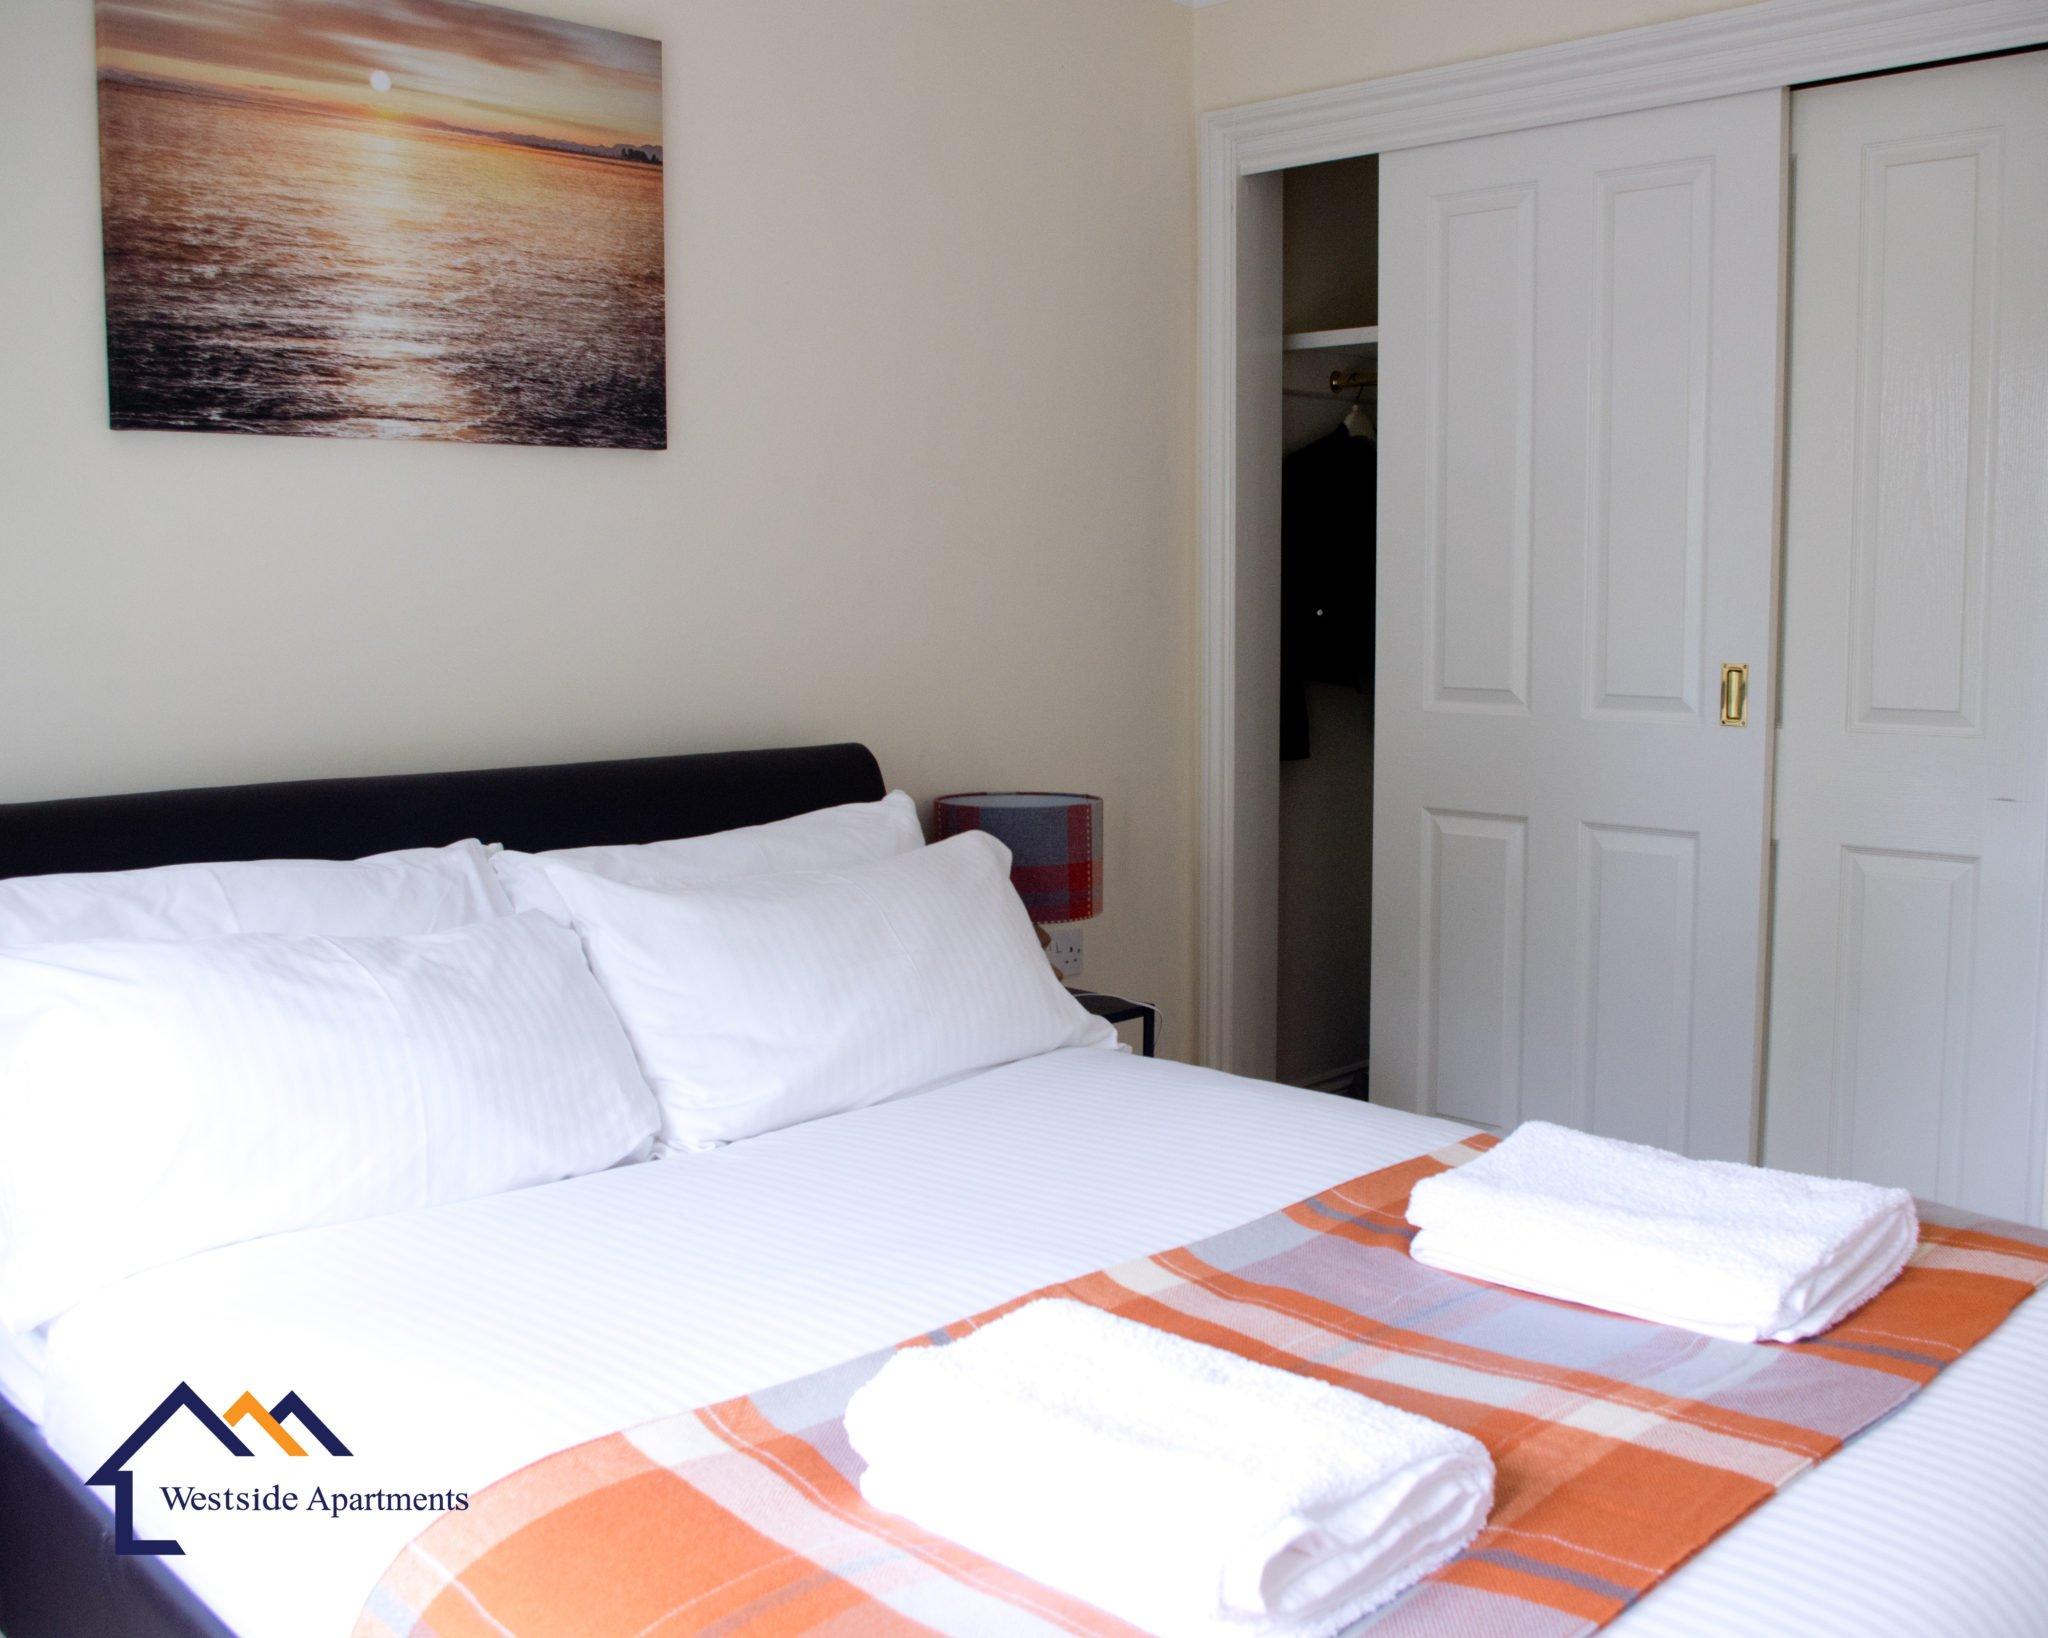 Basingstoke-Self-Catering-Accommodation-UK-|-Serviced-Apartments-Basingstoke-UK-|-Cheap-Short-Let-Accommodation-Hampshire-|-Urban-Stay